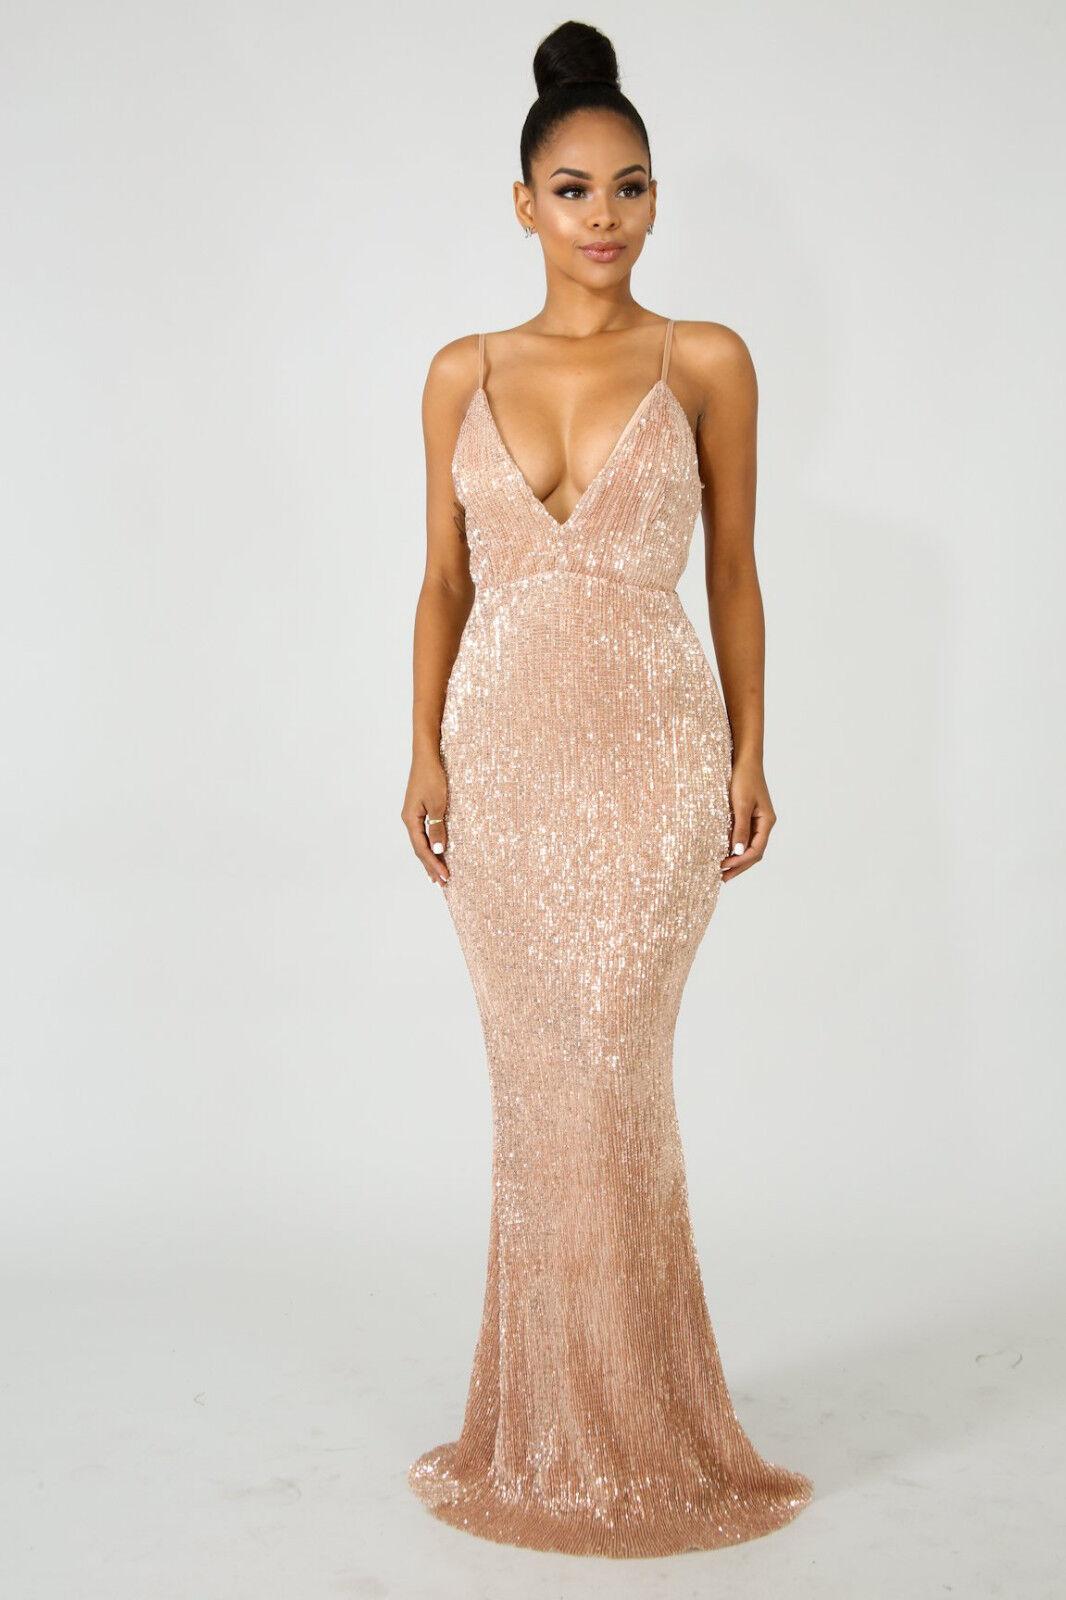 damen Rosa Gold Sequins V-Neck Cocktail Maxi Gown Dress